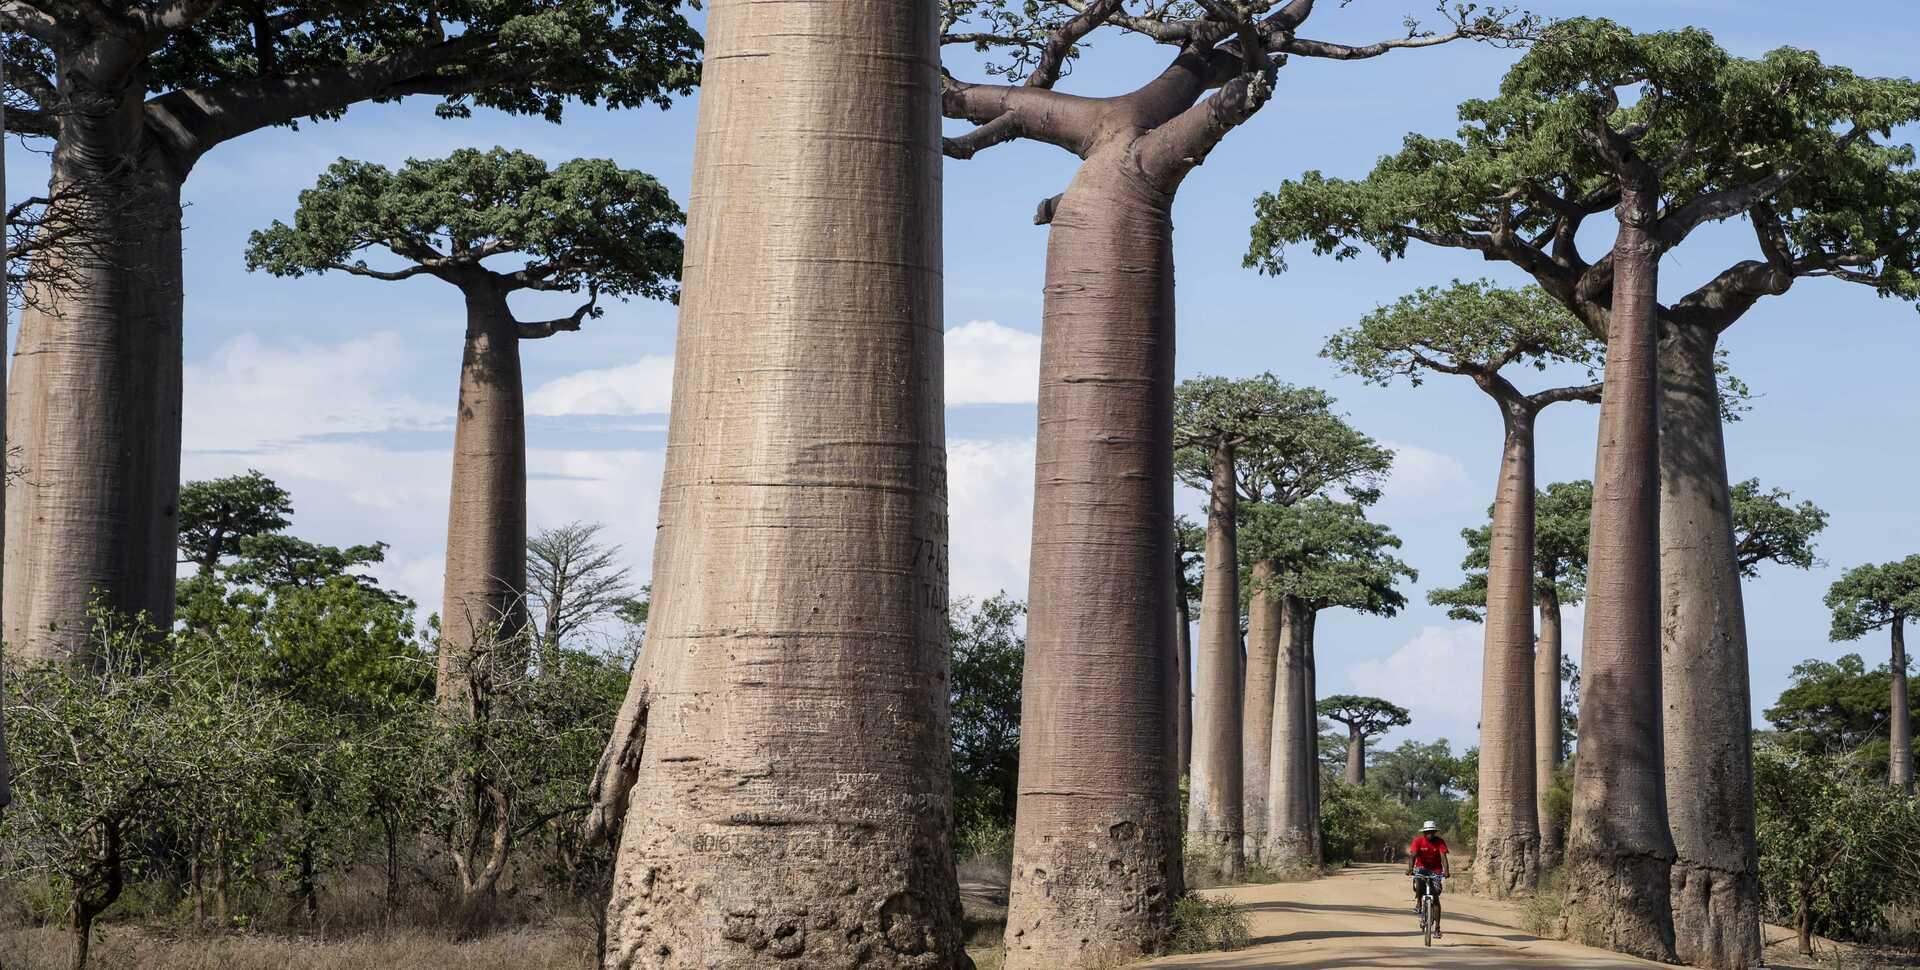 A man on a bike rides through a grove of baobab trees in Madagascar